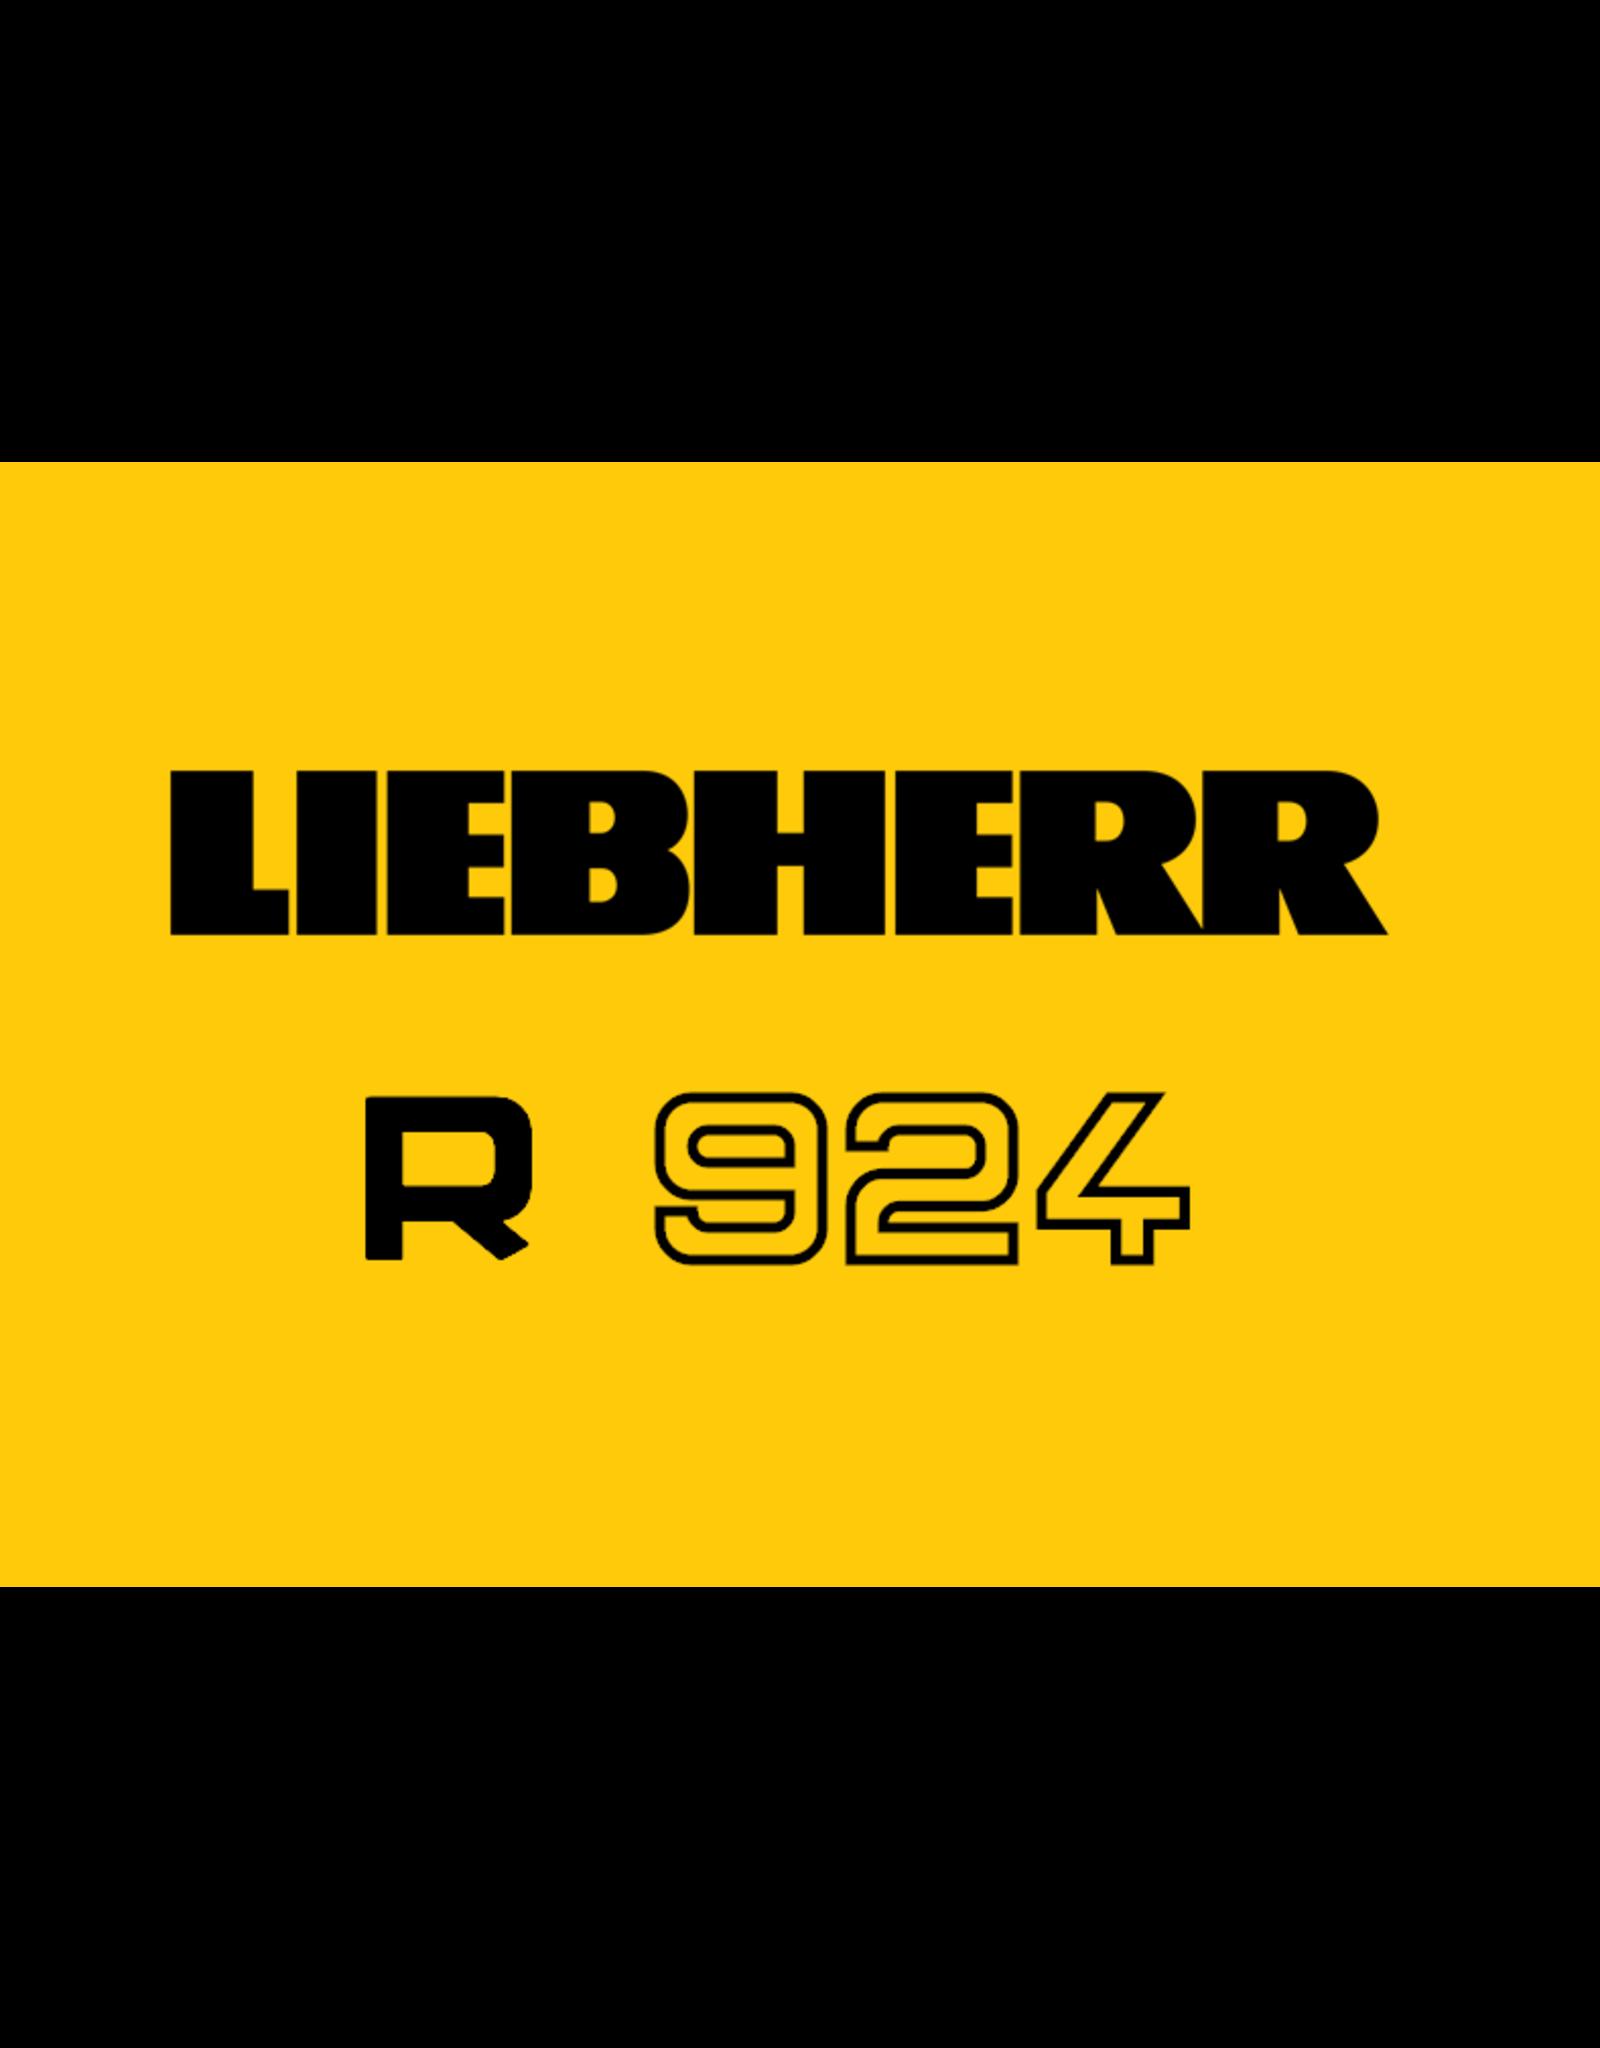 Echle Hartstahl GmbH FOPS for Liebherr R 924